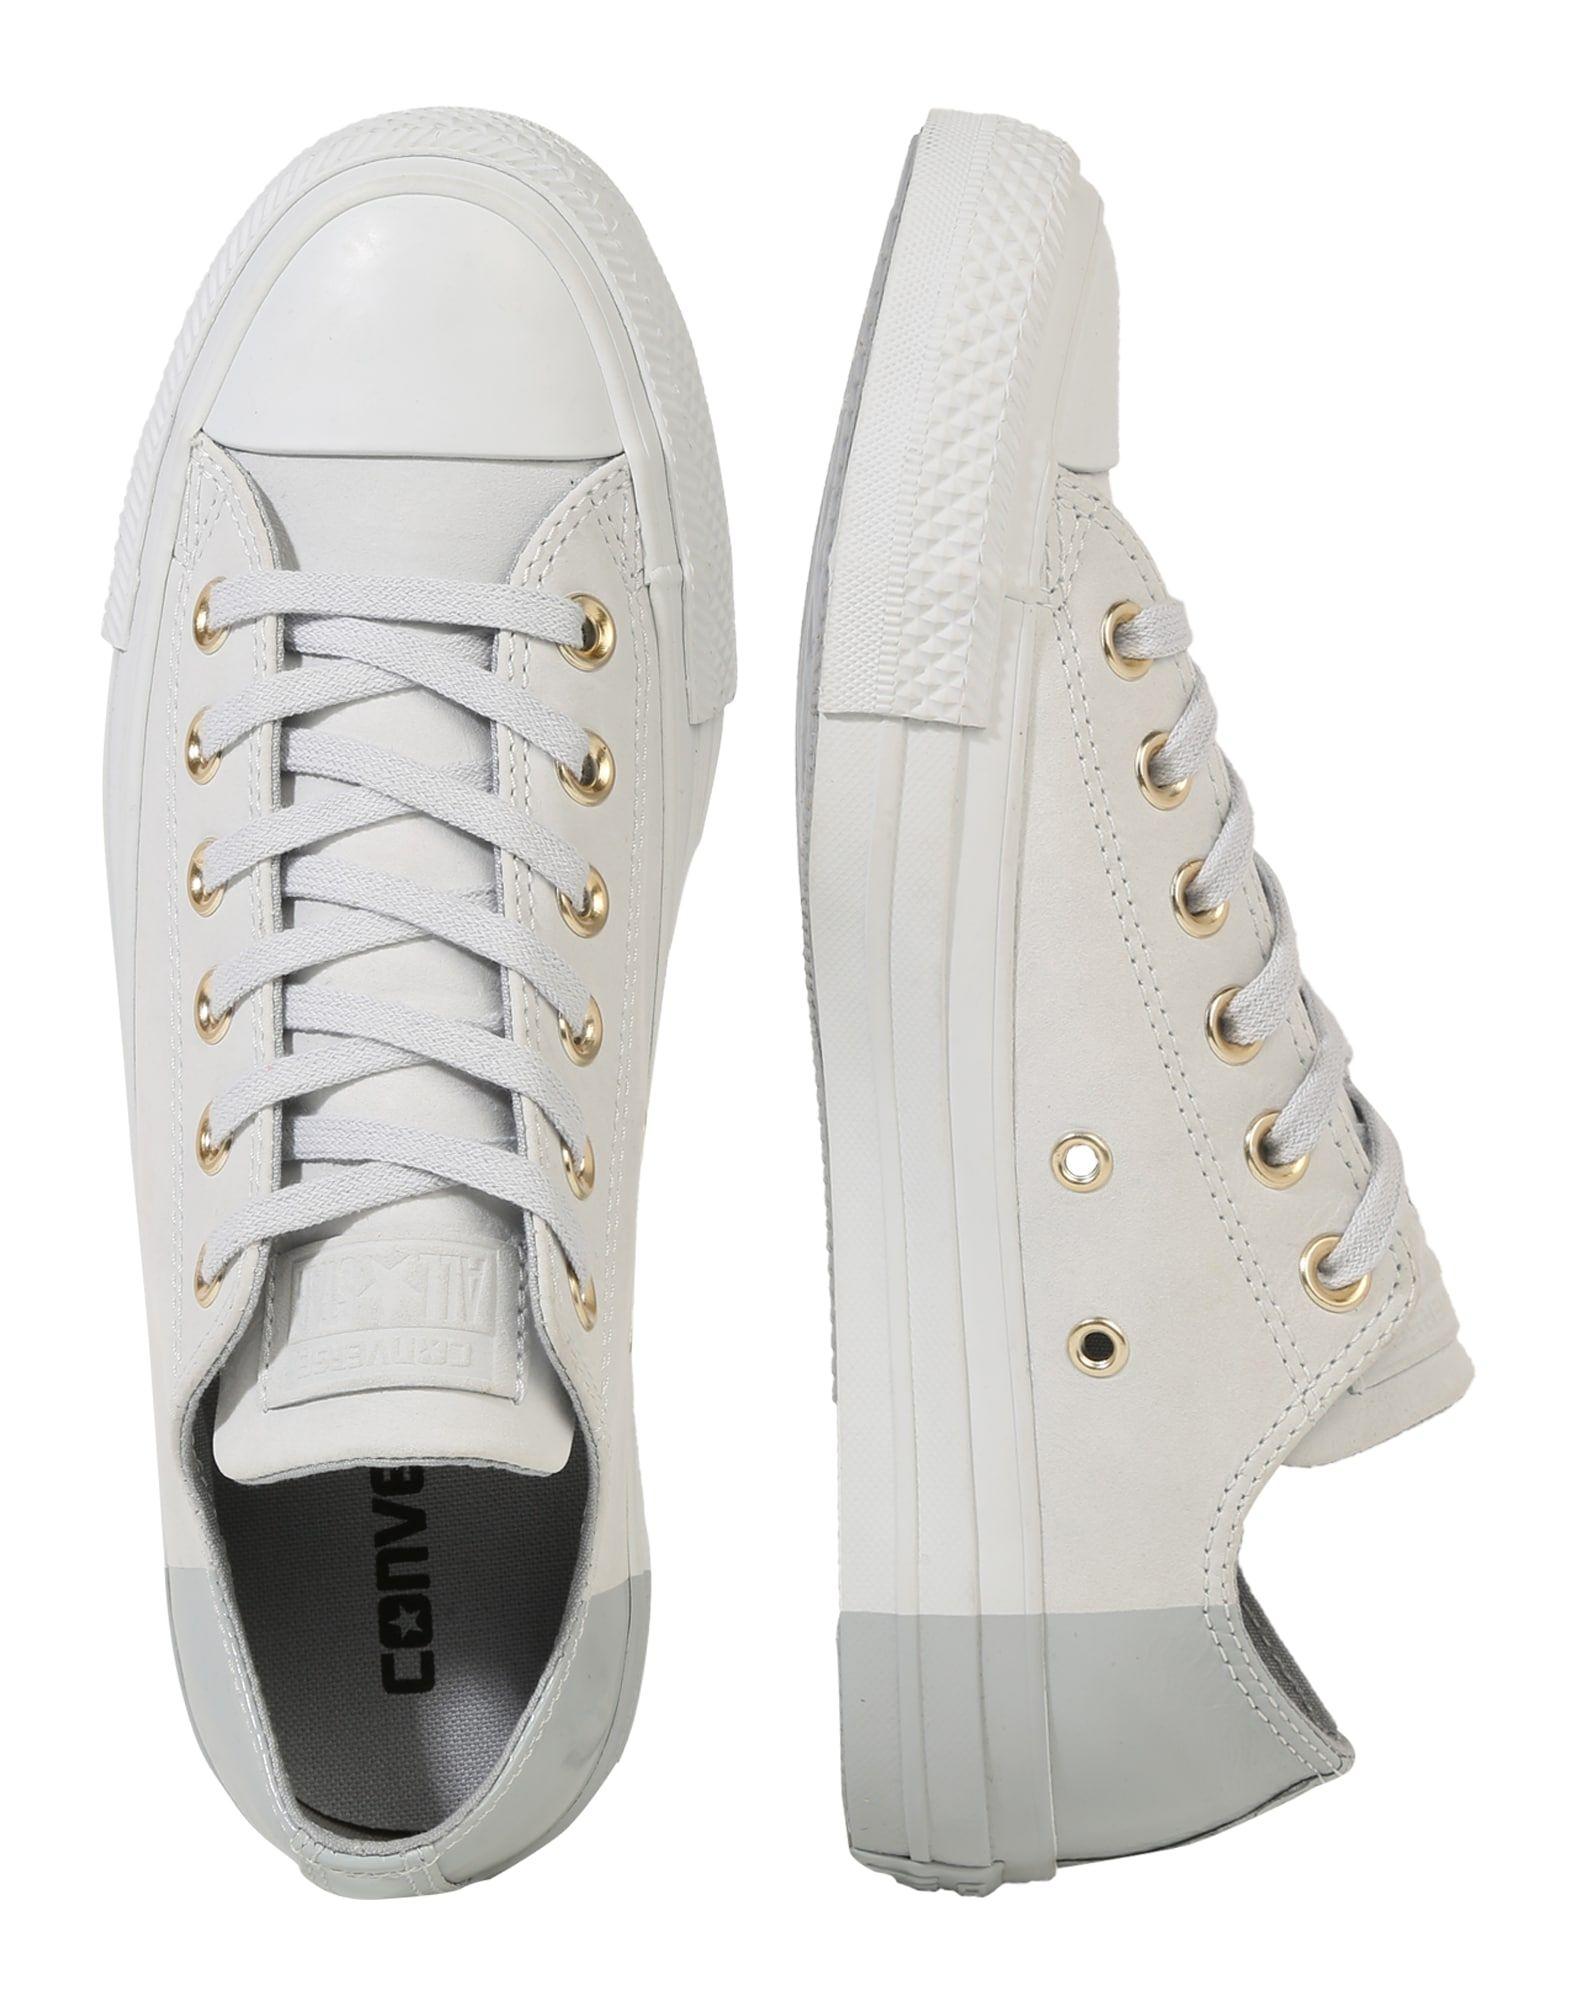 CONVERSE Sneaker 'CHUCK TAYLOR ALL STAR OX' Damen, Grau